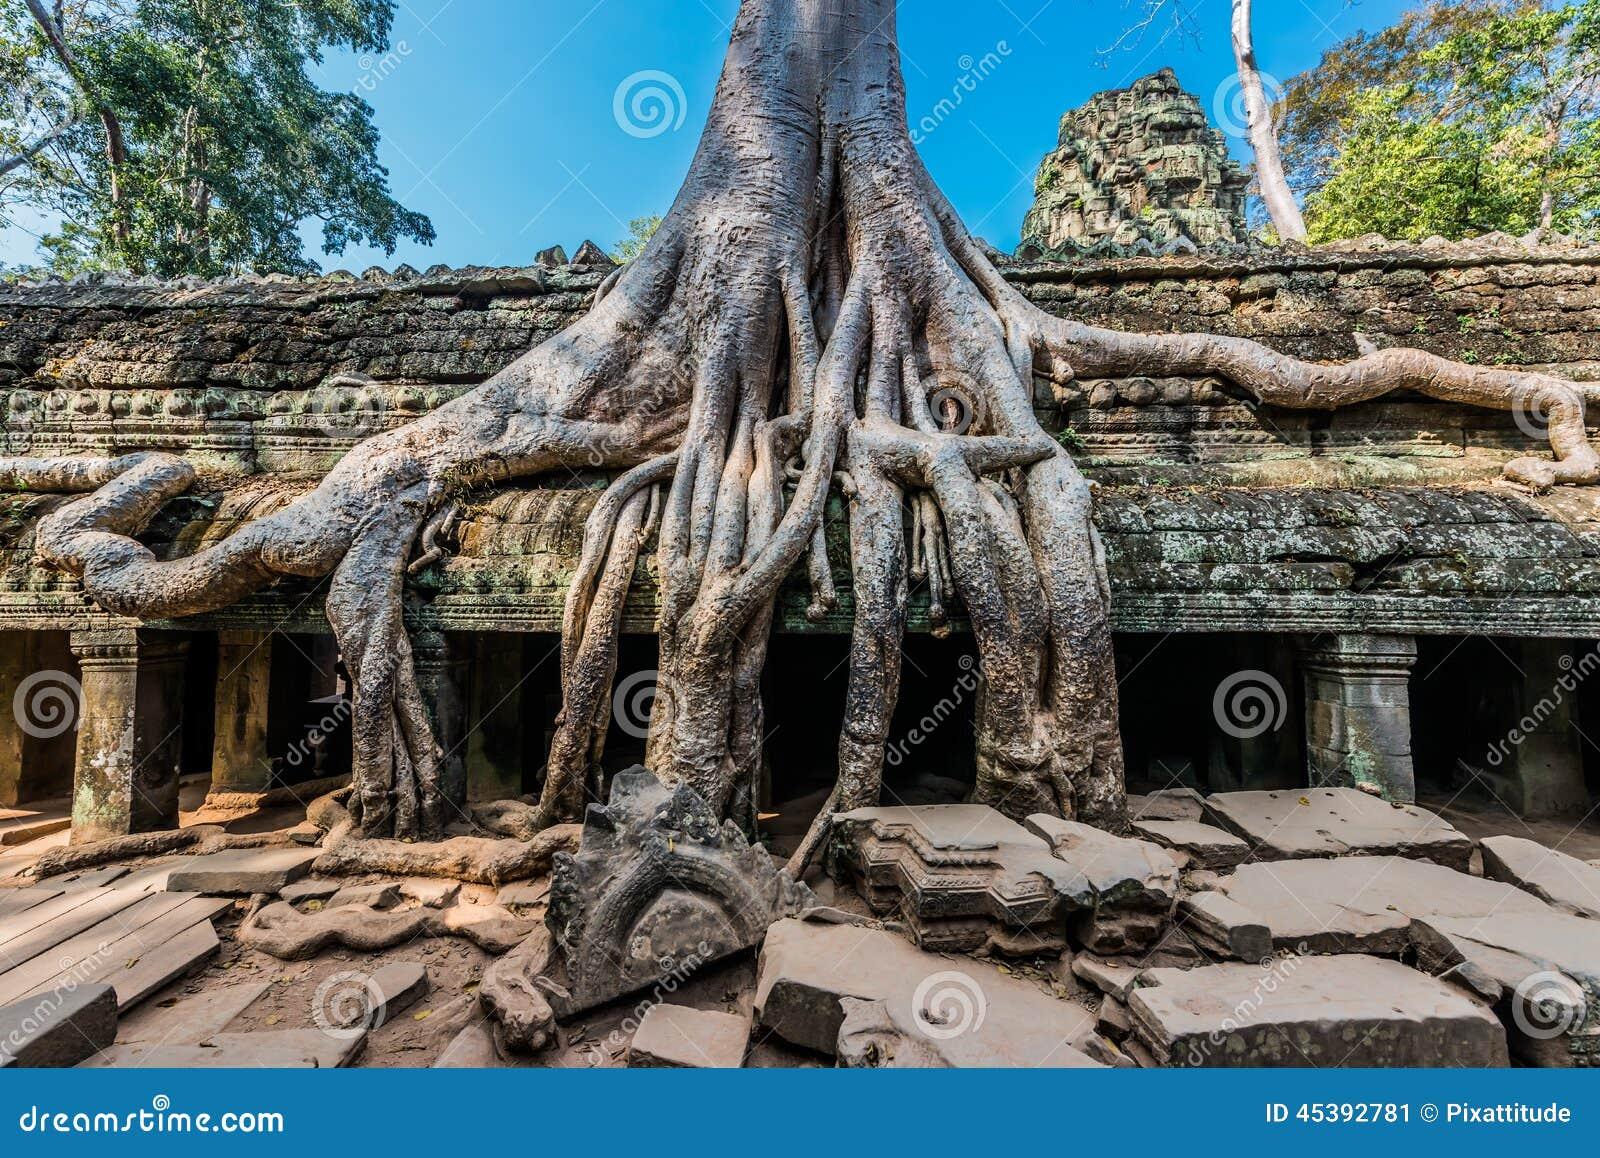 [Jeu] Association d'images - Page 19 Banyan-tree-ta-prohm-angkor-wat-cambodia-ruins-45392781